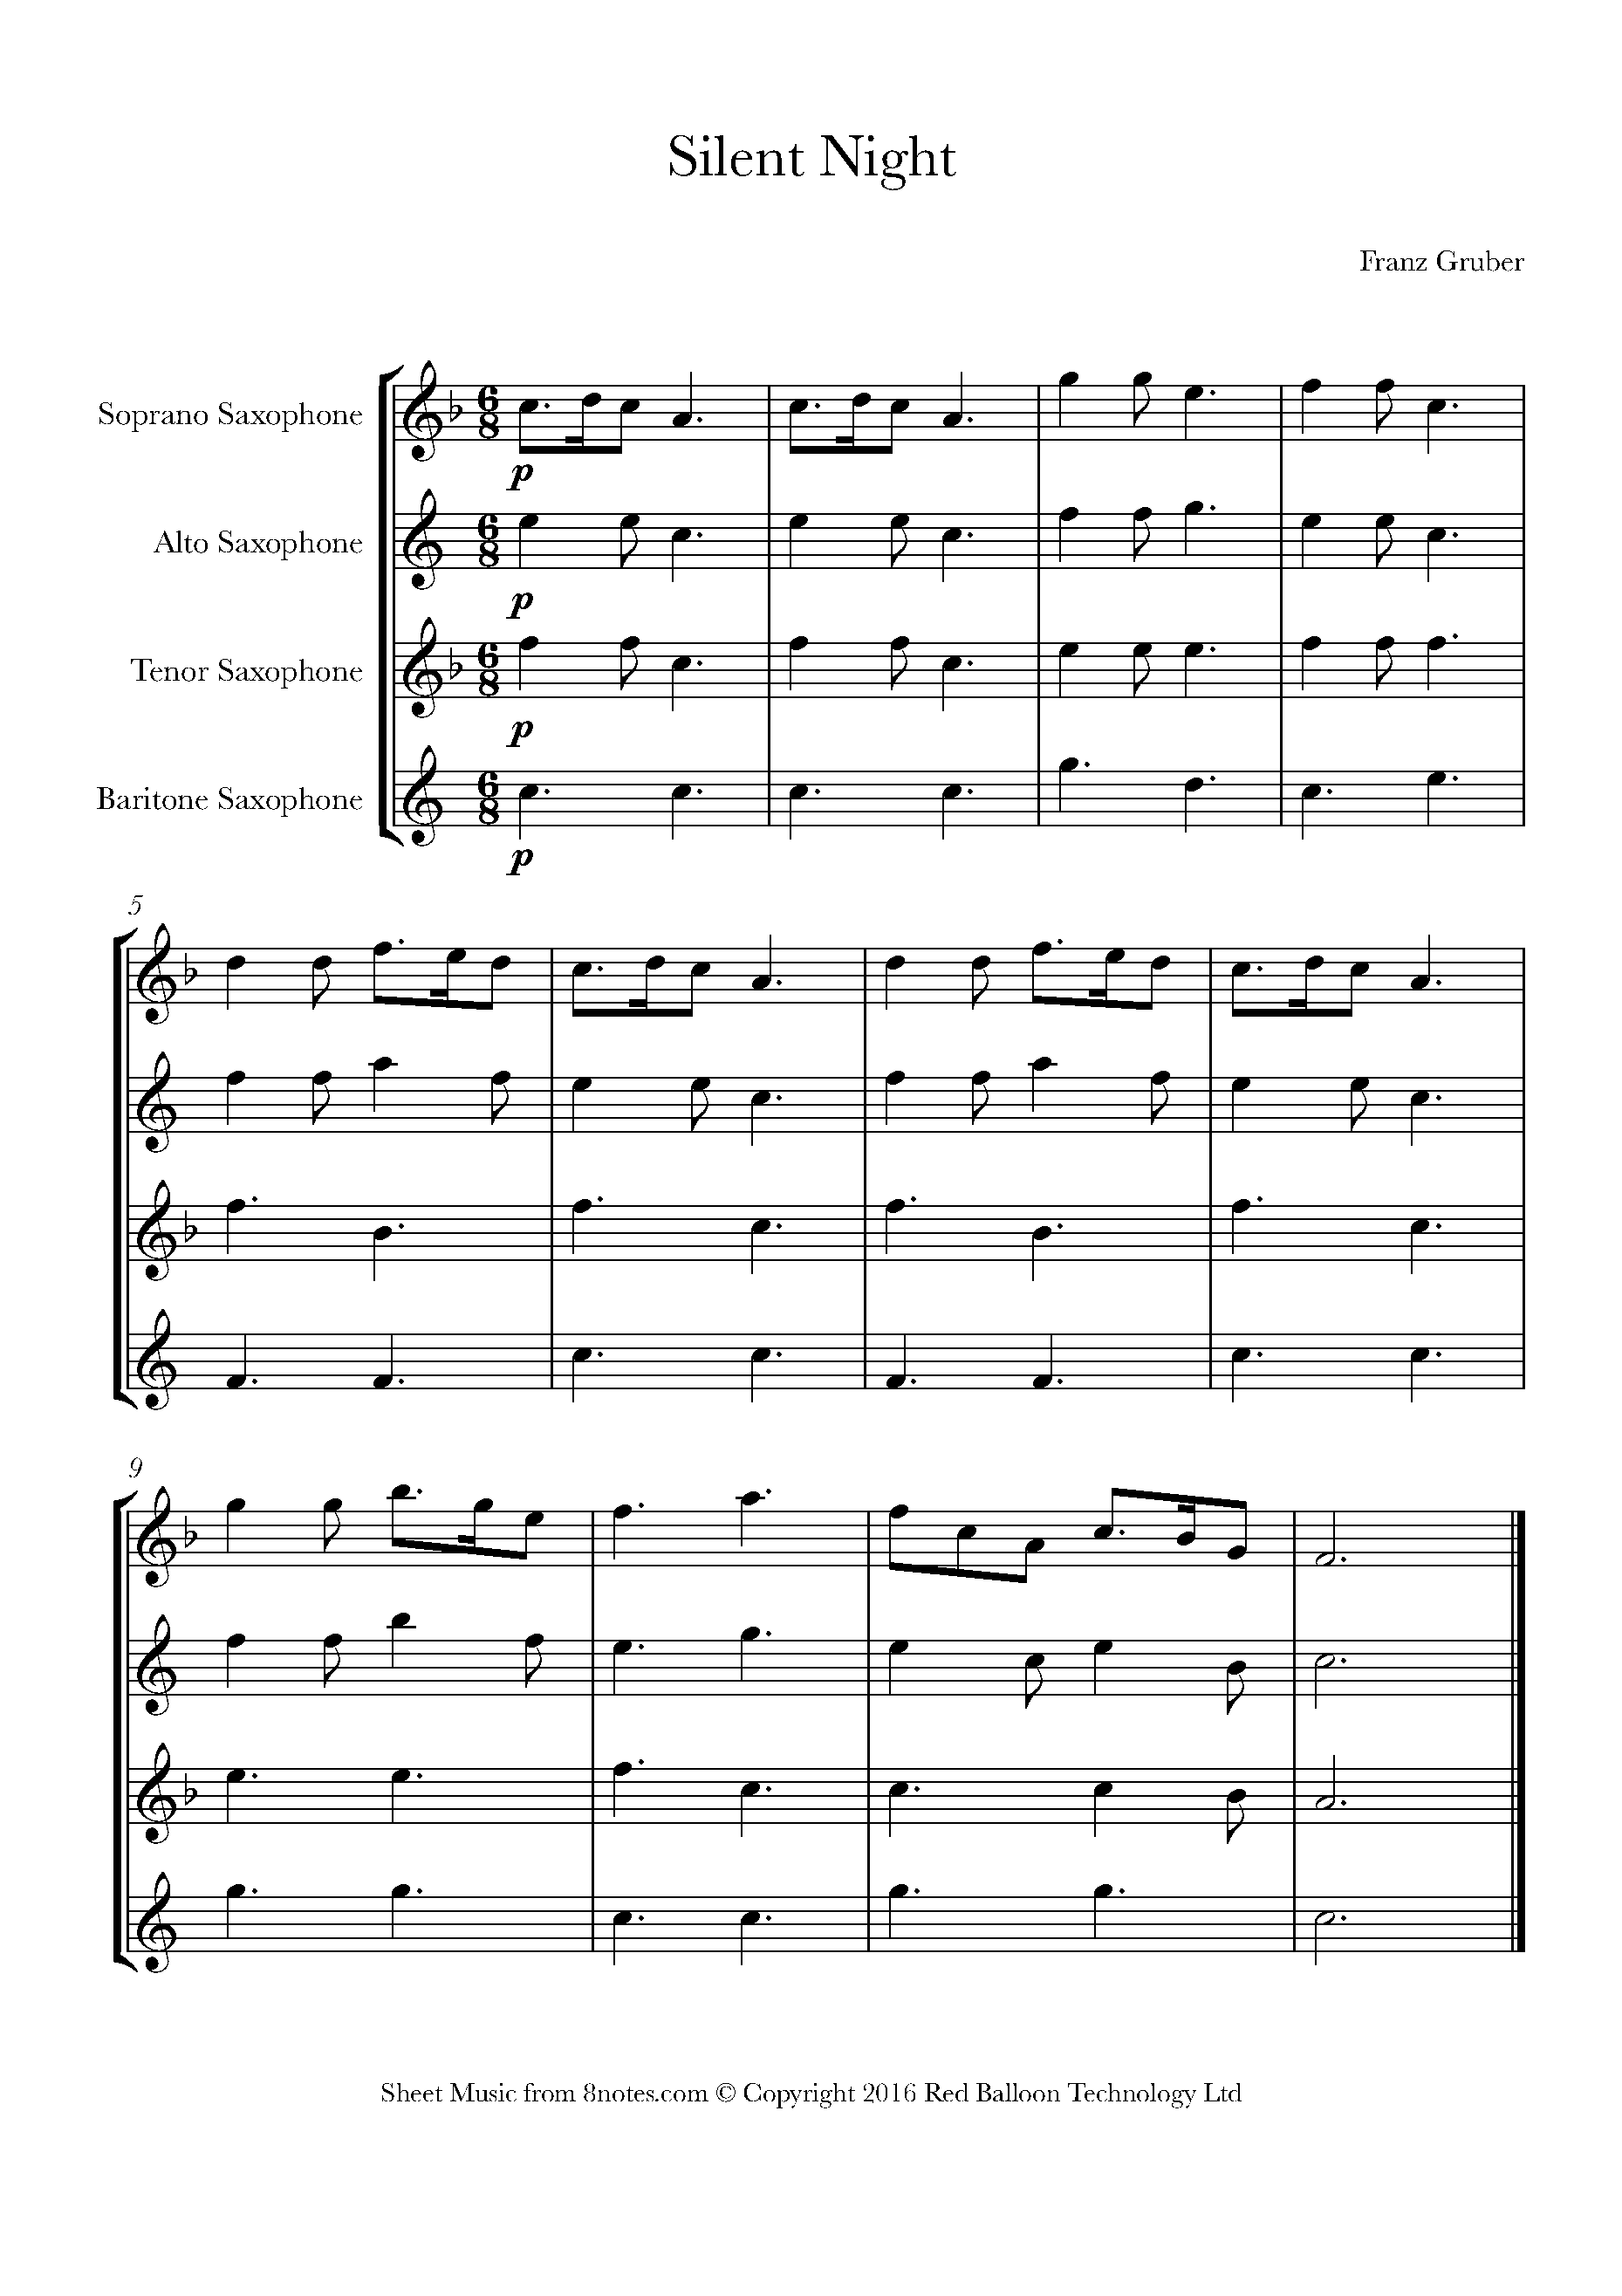 silent night sheet music for saxophone quartet - 8notes.com  8notes